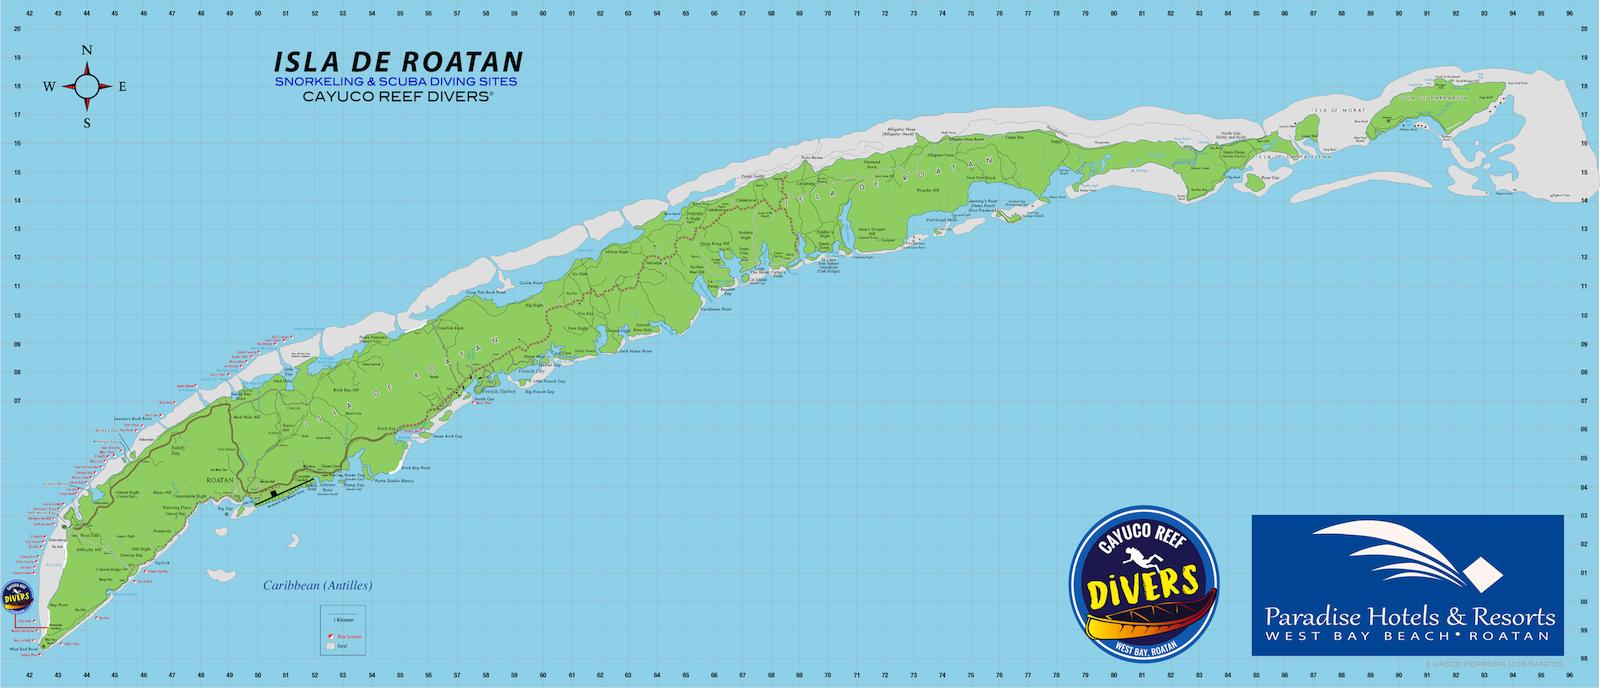 CAYUCO-REEF-DIVERS-ROATAN-MAP-FULL1600.png